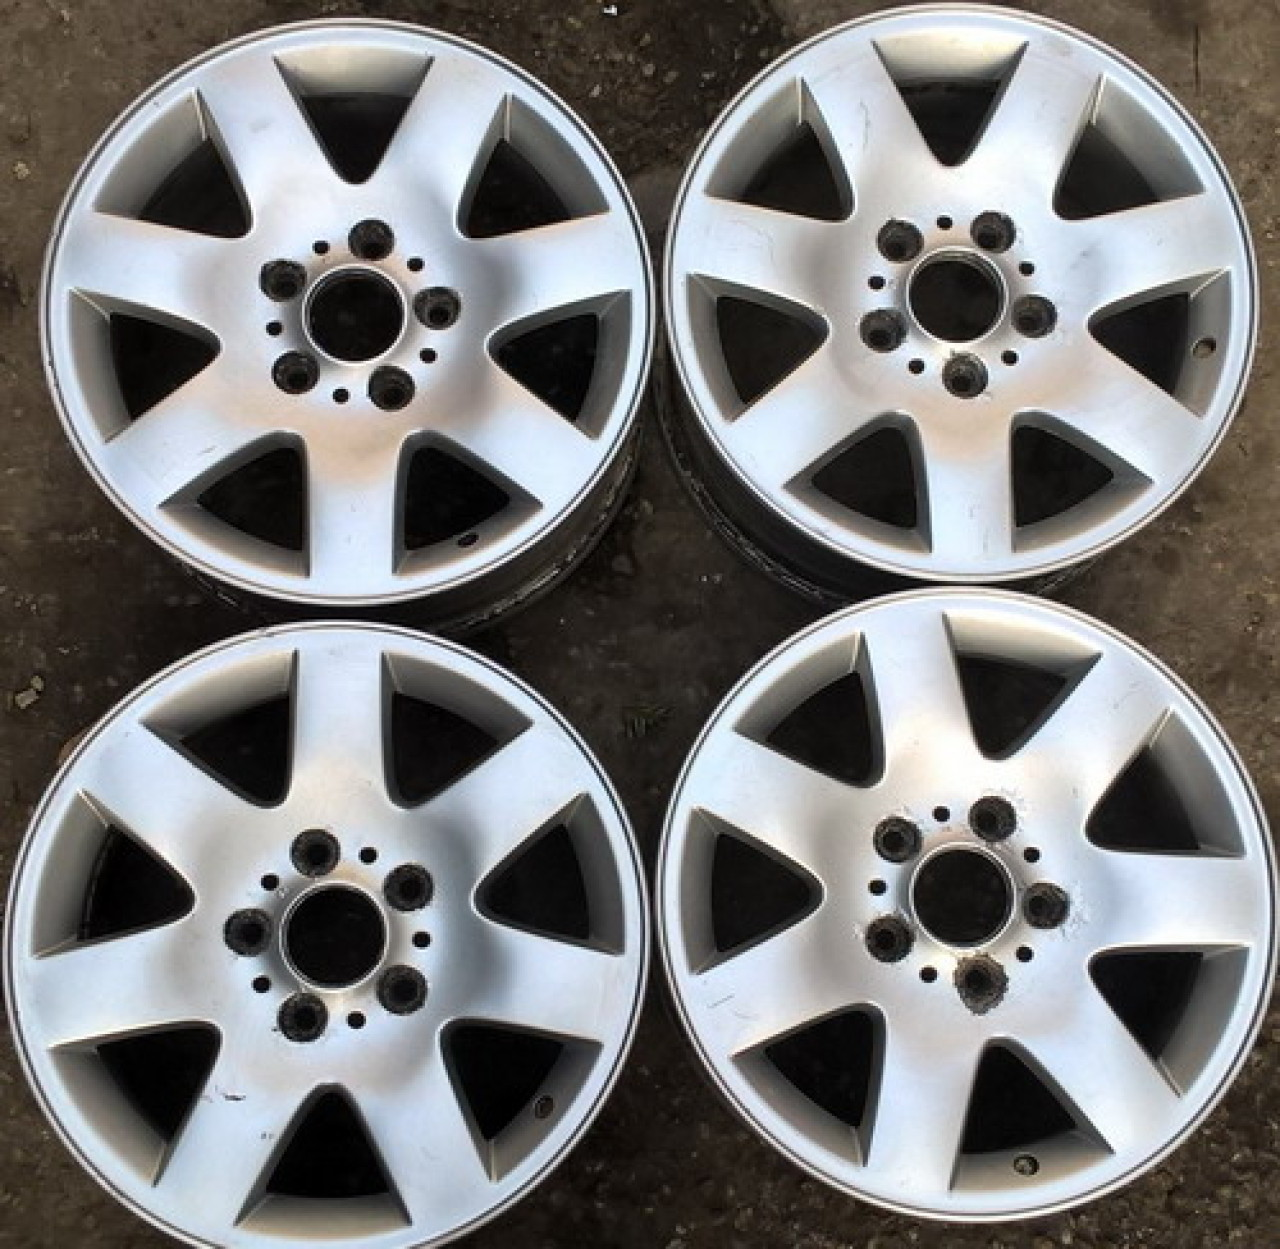 Jenti originale BMW R16, serie 3,1, Mini Countryman-Paqceman, VW Amarok, Opel Insignia